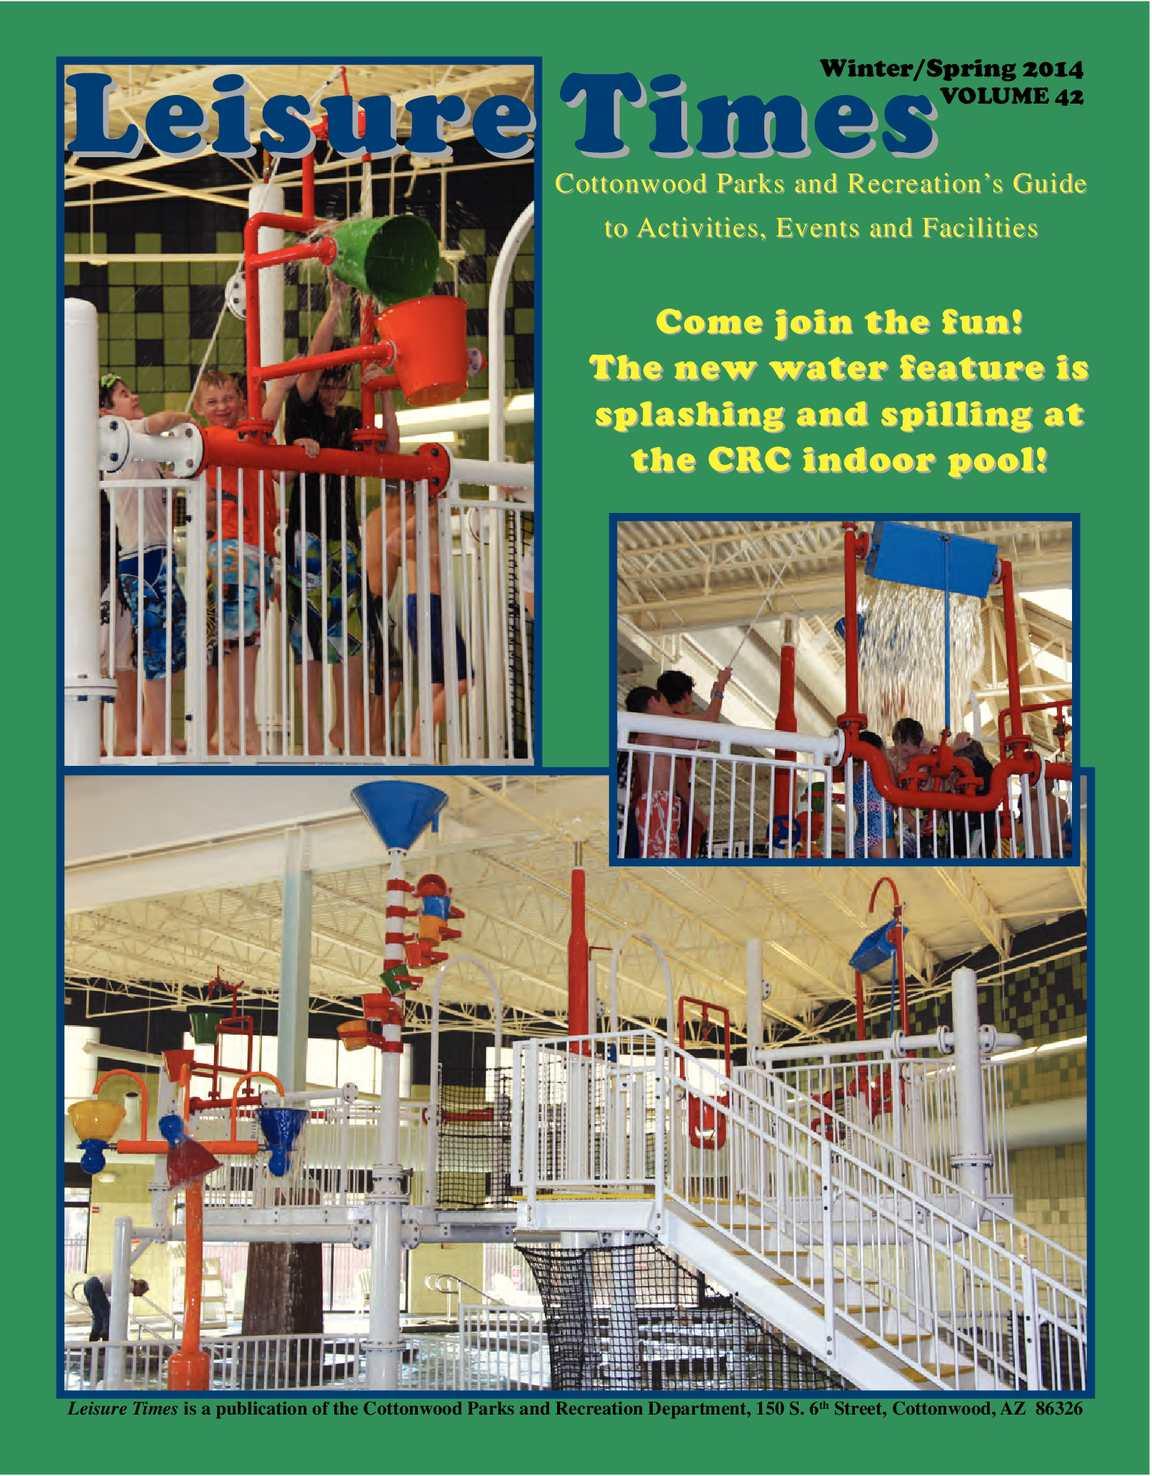 Calaméo - Cottonwood Recreation s Leisure Times Winter Spring 2014 0c7ac86315d66